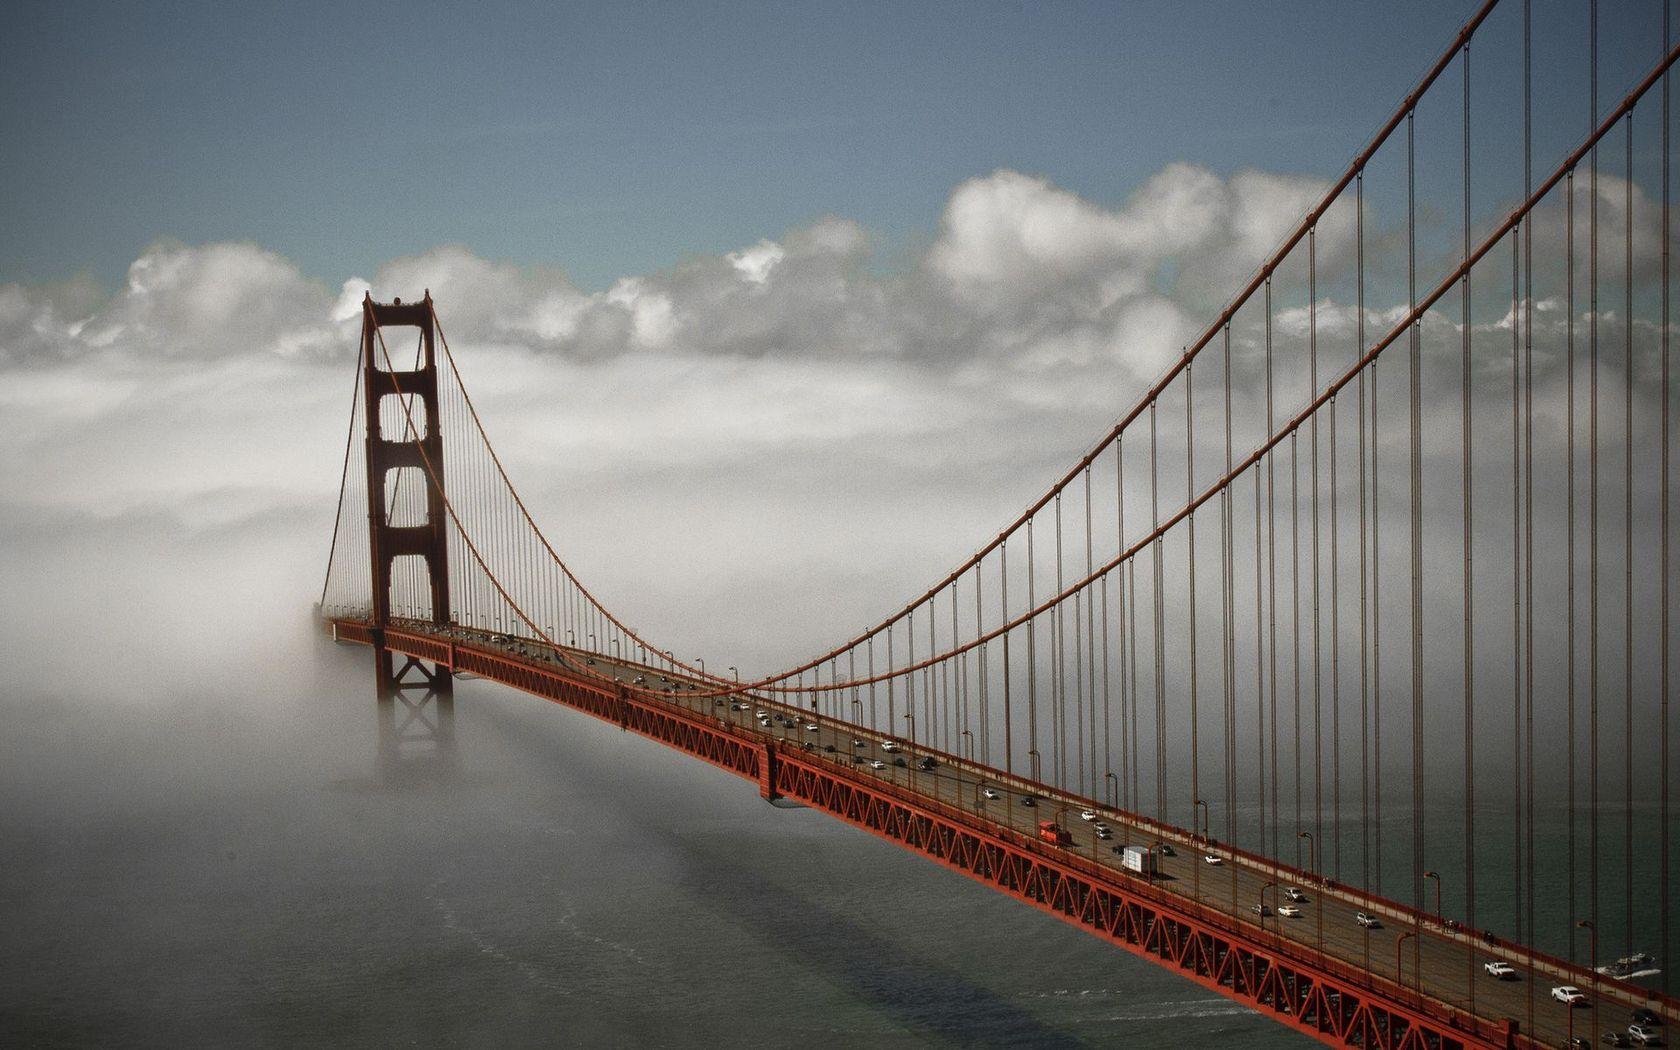 Golden Gate Bridge wallpaper 19172 1680x1050